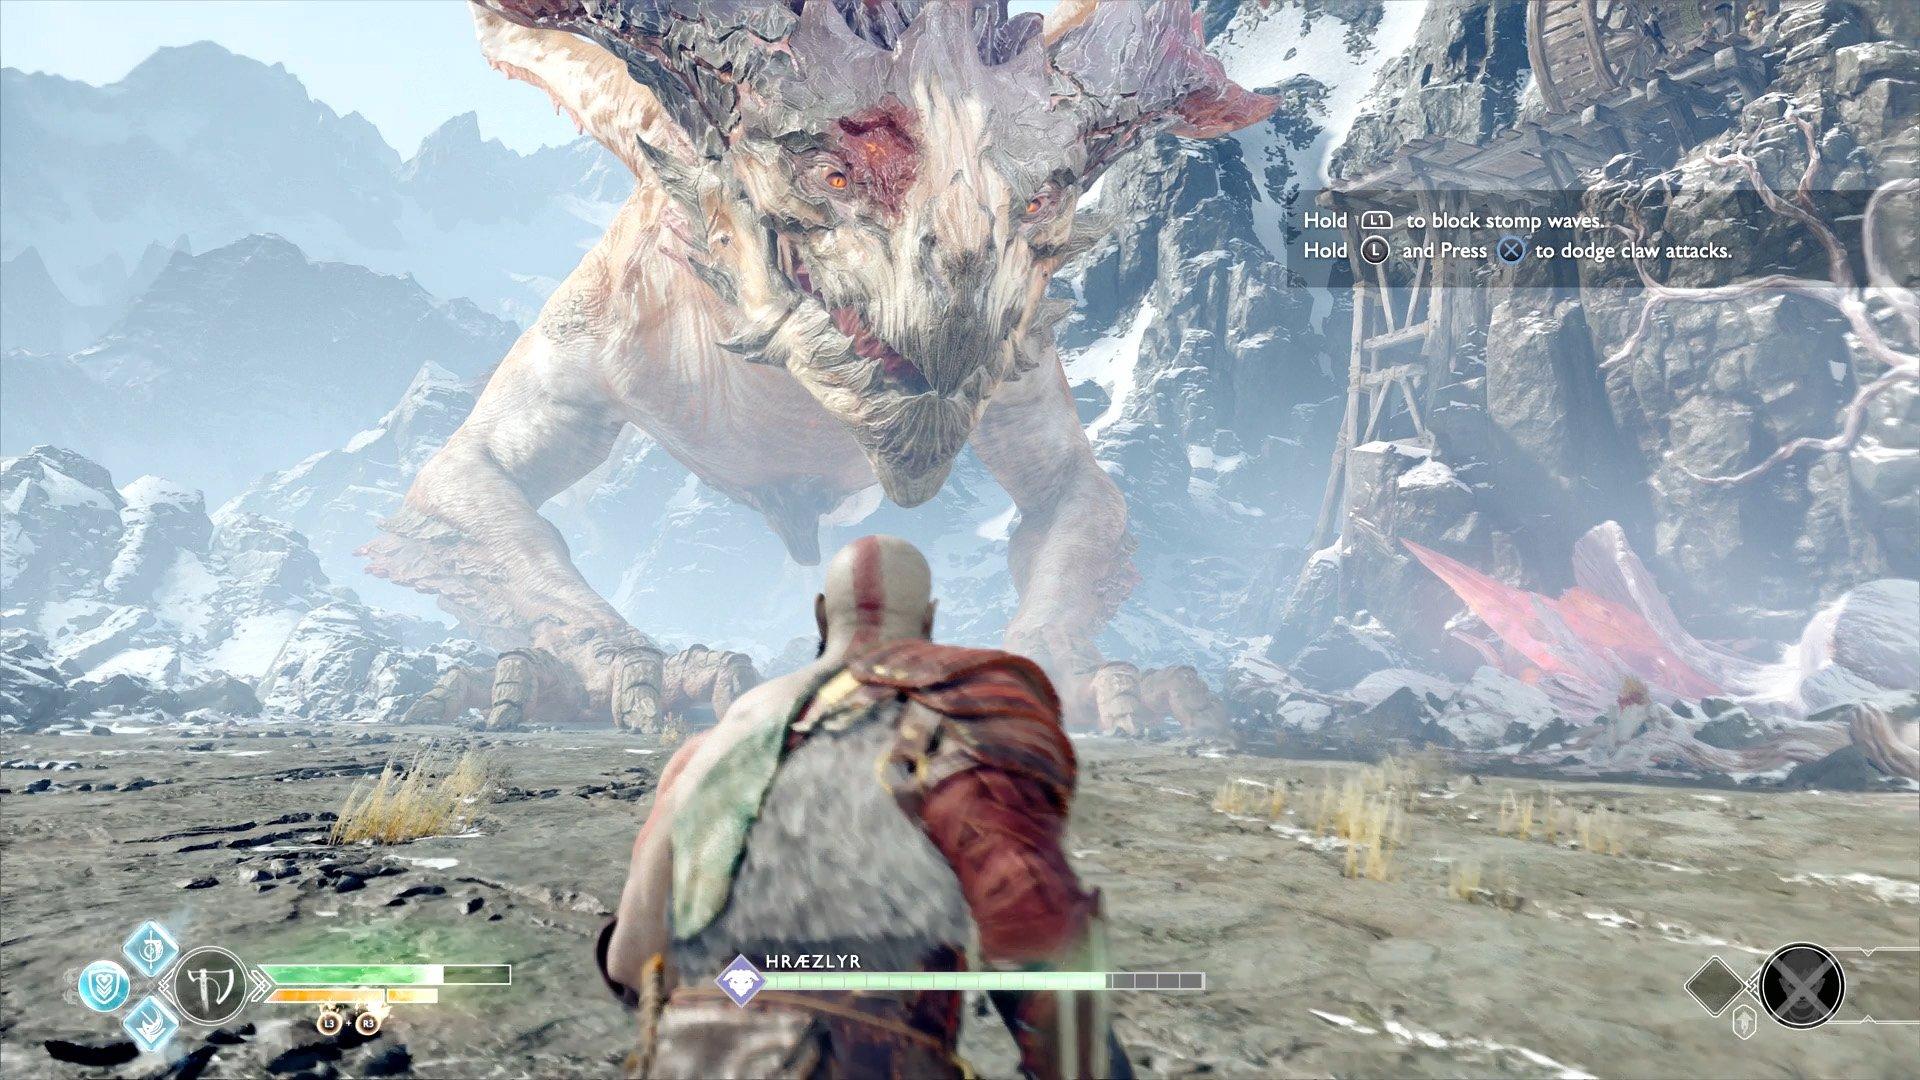 © God of War / Sony Interactive Entertainment / Fair Use